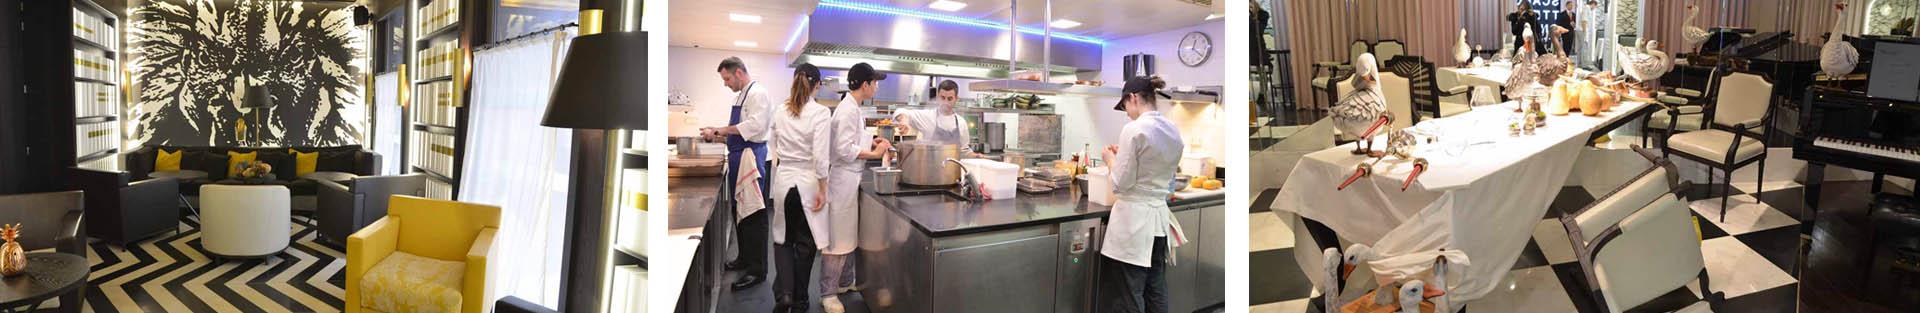 restaurants Hexagone Histoires chef Mathieu Pacaud